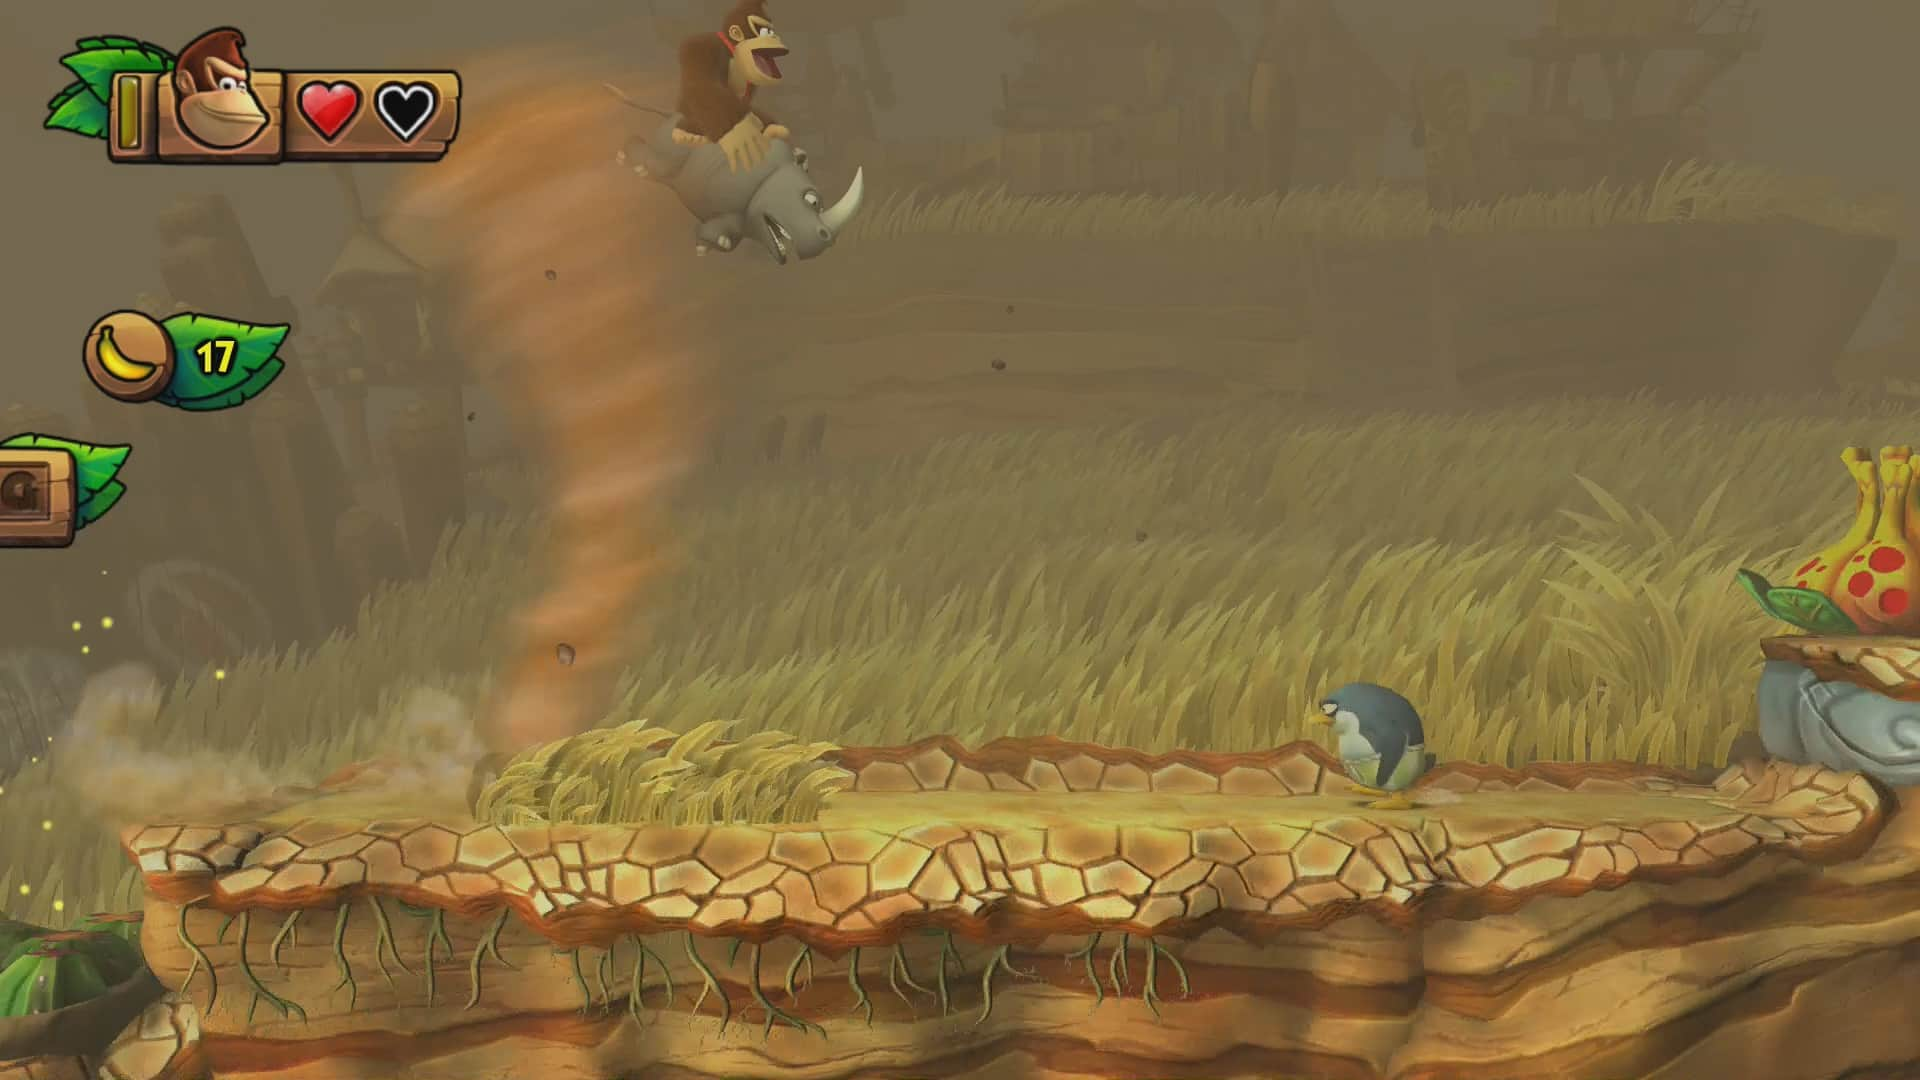 Donkey Kong Country: Tropical Freeze 3-3 Frantic Fields Screenshot